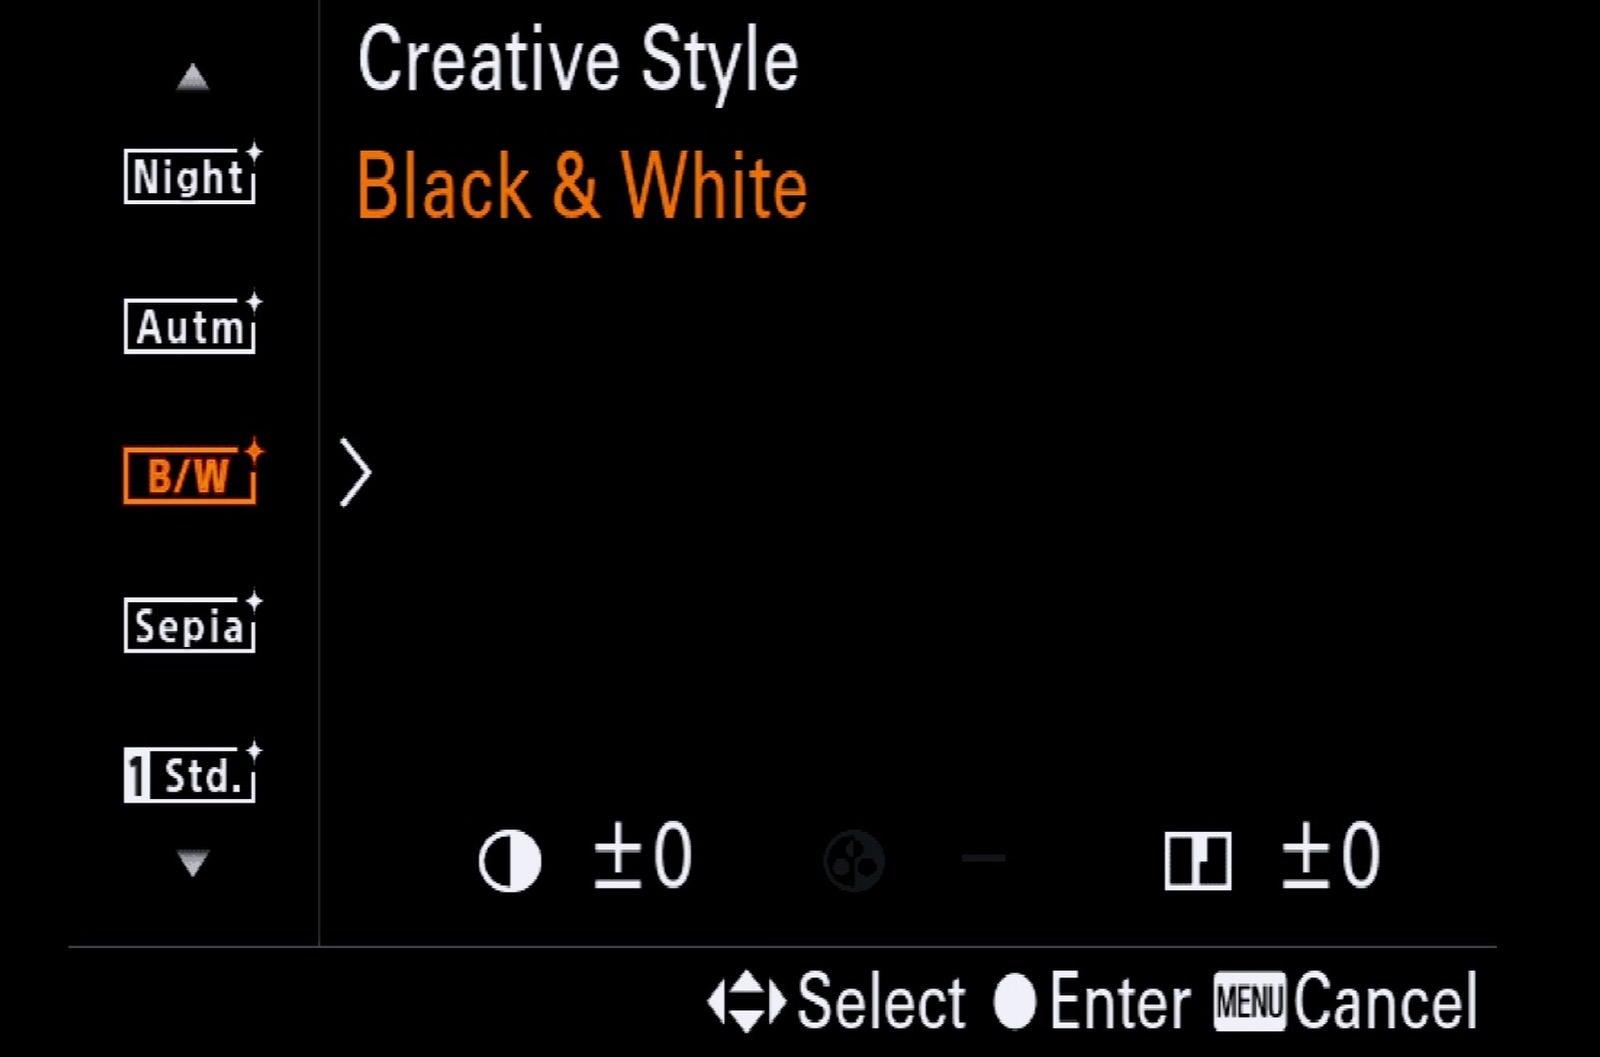 Alpha-Universe-Camera-Setup-Black-And-White-4.jpg